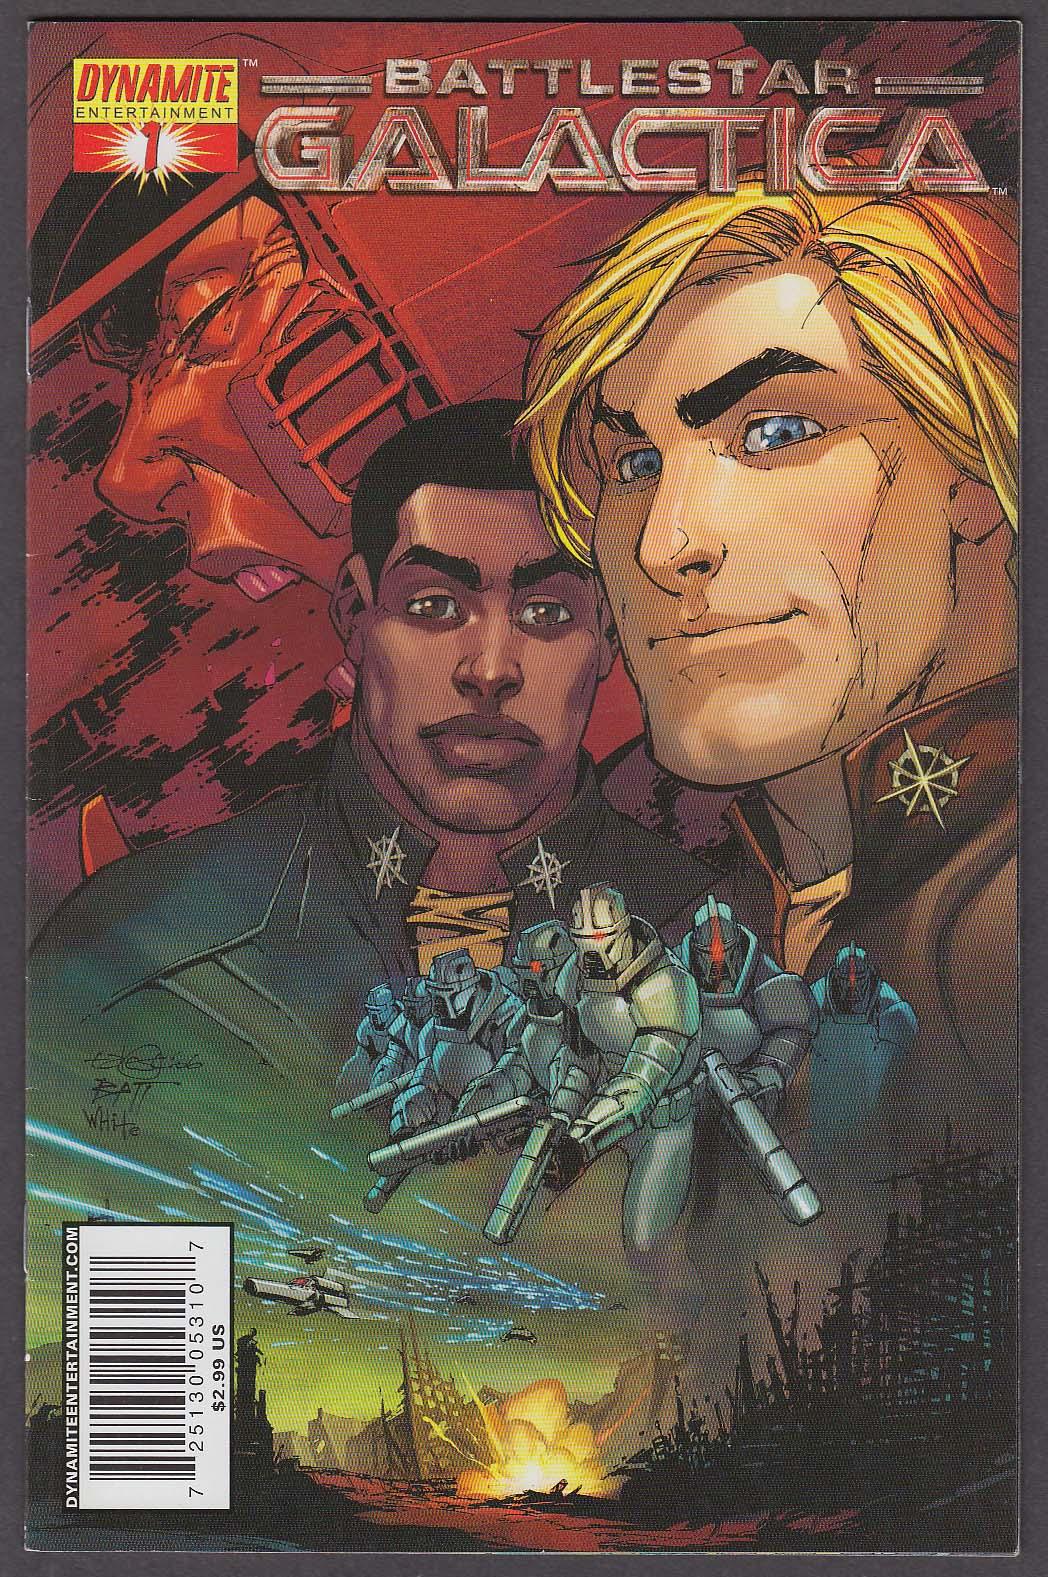 BATTLESTAR GALACTICA #1 Dynamite comic book 2006 1st Printing